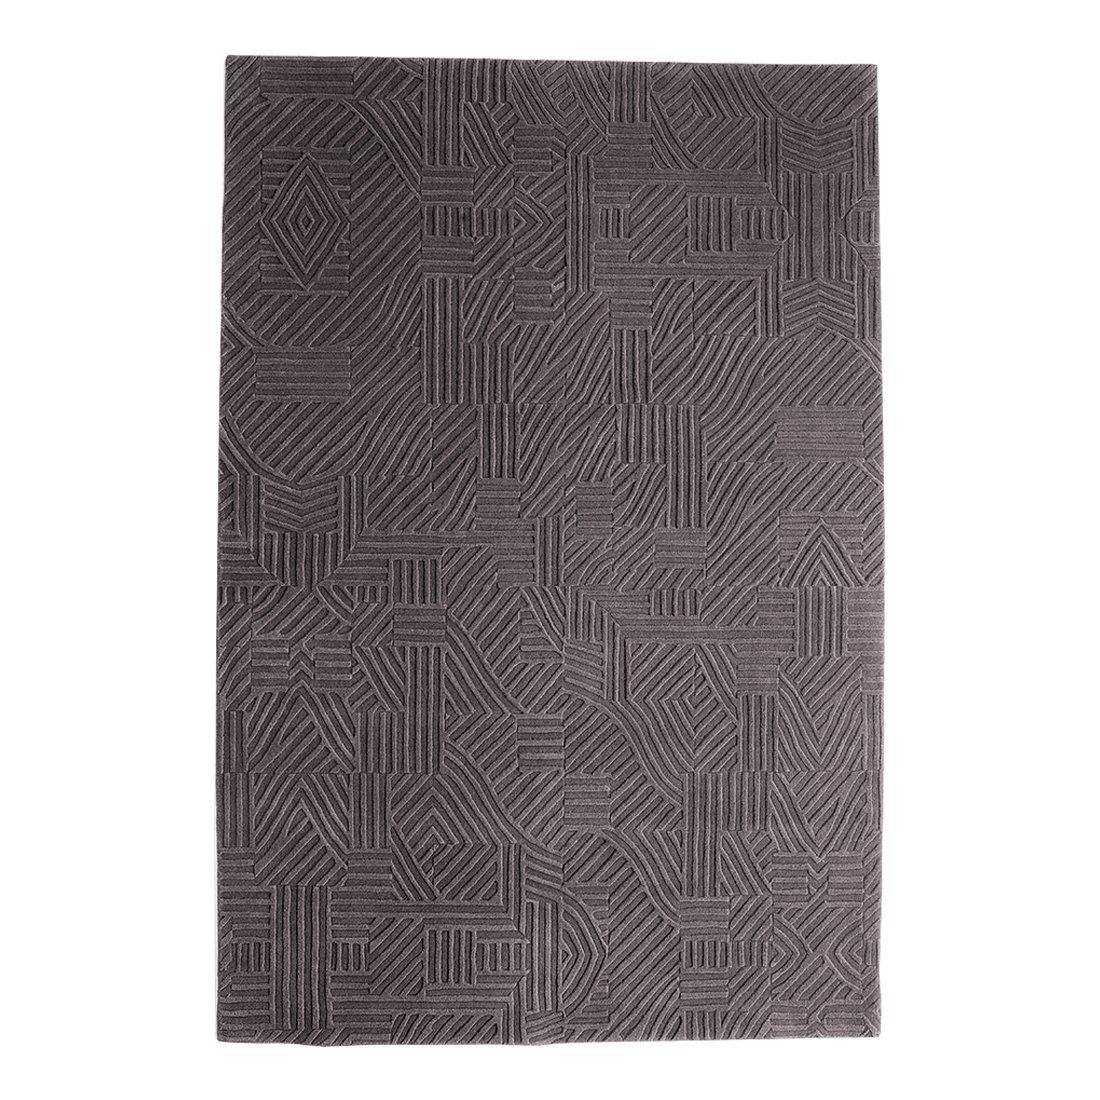 Nanimarquina African Pattern 1 Vloerkleed Extra Large - Mosgroen